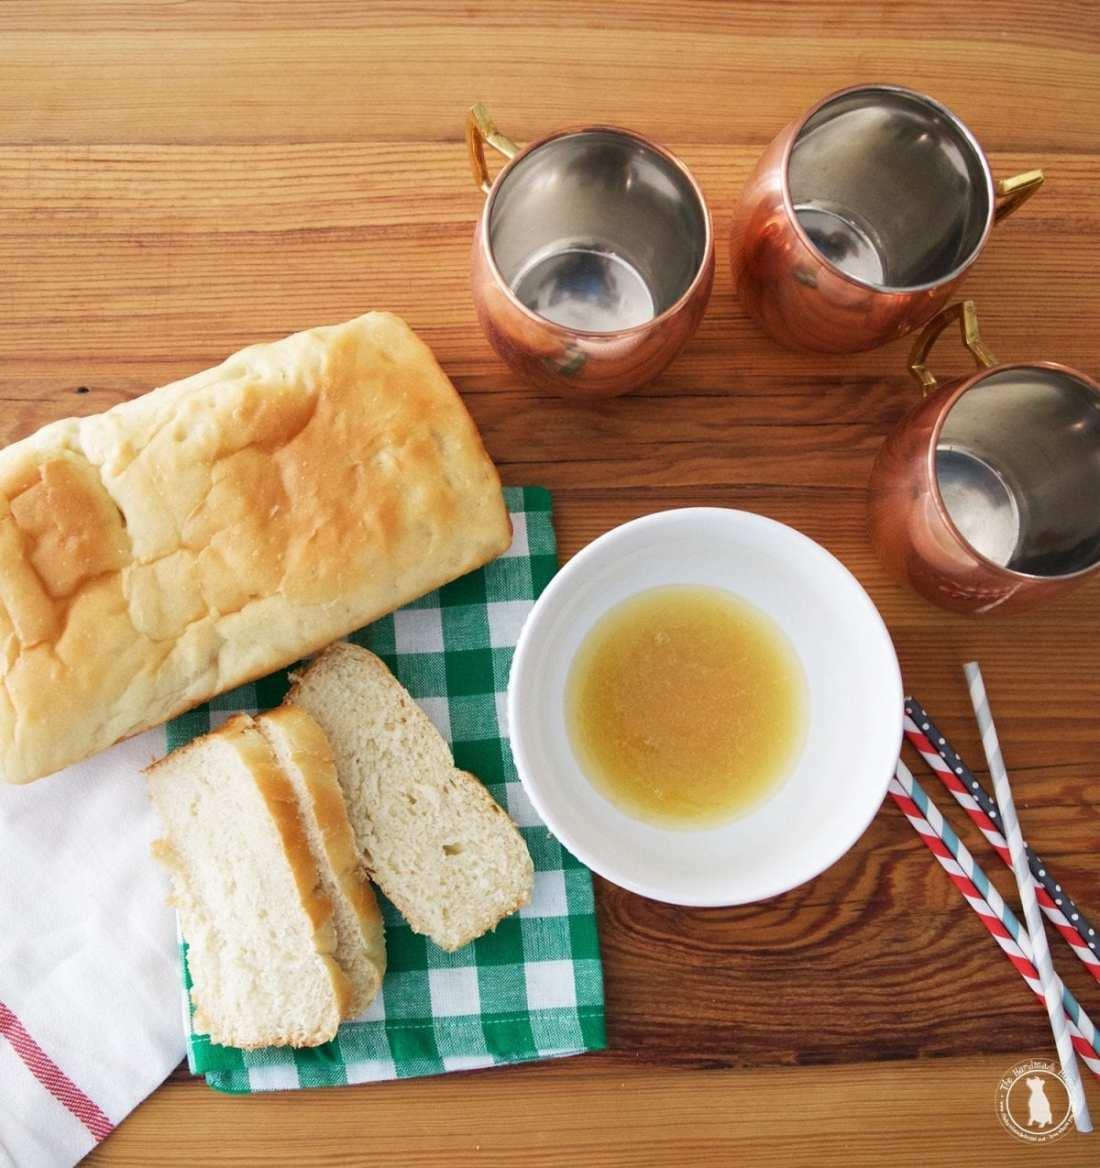 baked_bread_fresh